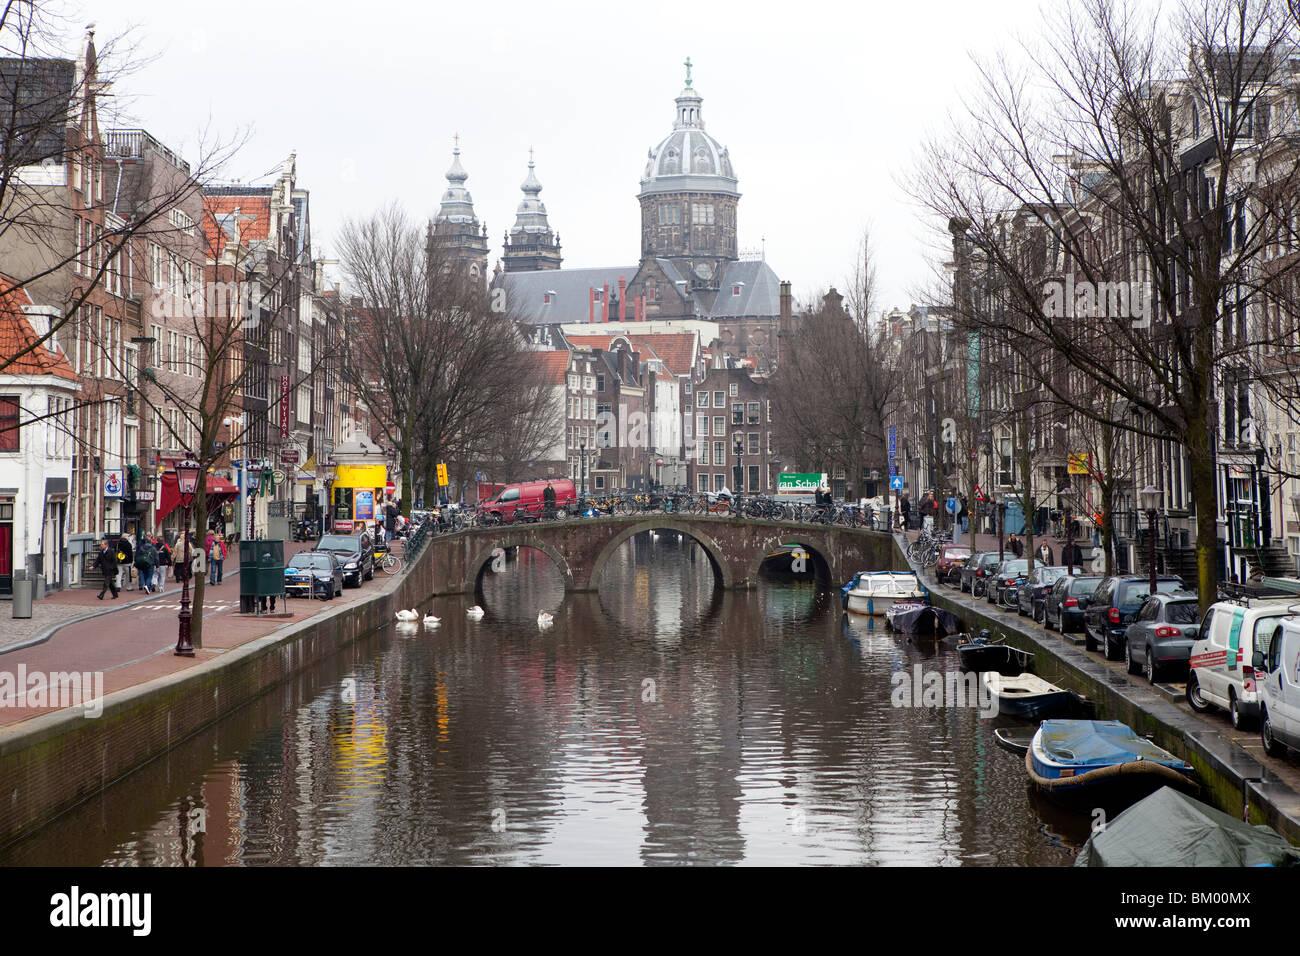 Canal, Jordaan area, Amsterdam Netherlands - Stock Image